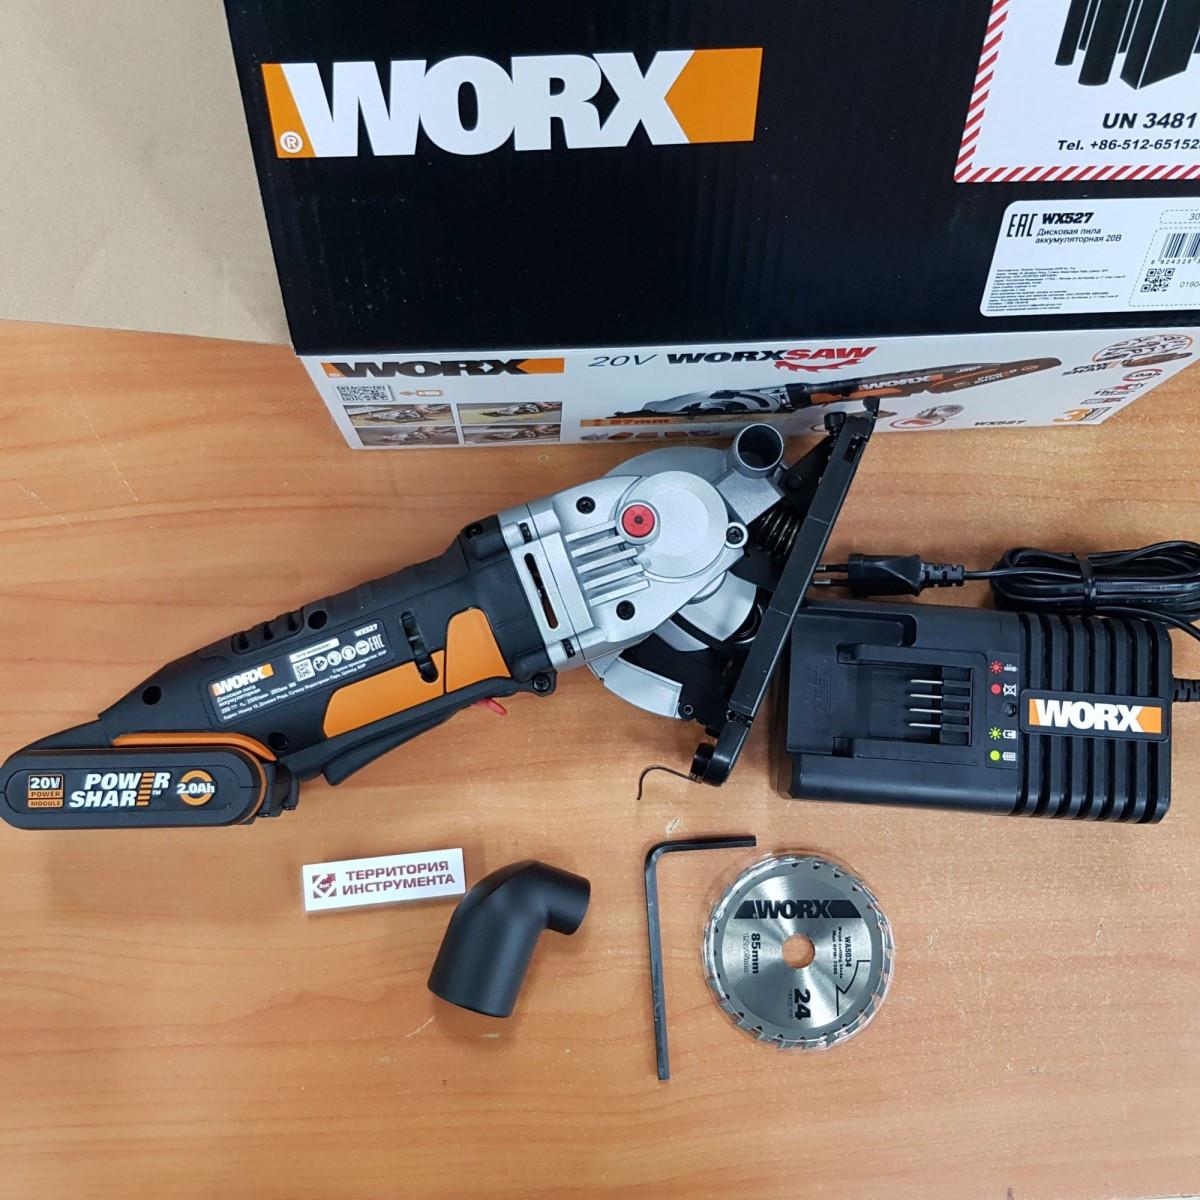 Пила дисковая WORX SAW WX527 (20В, 1x2.0Ач)